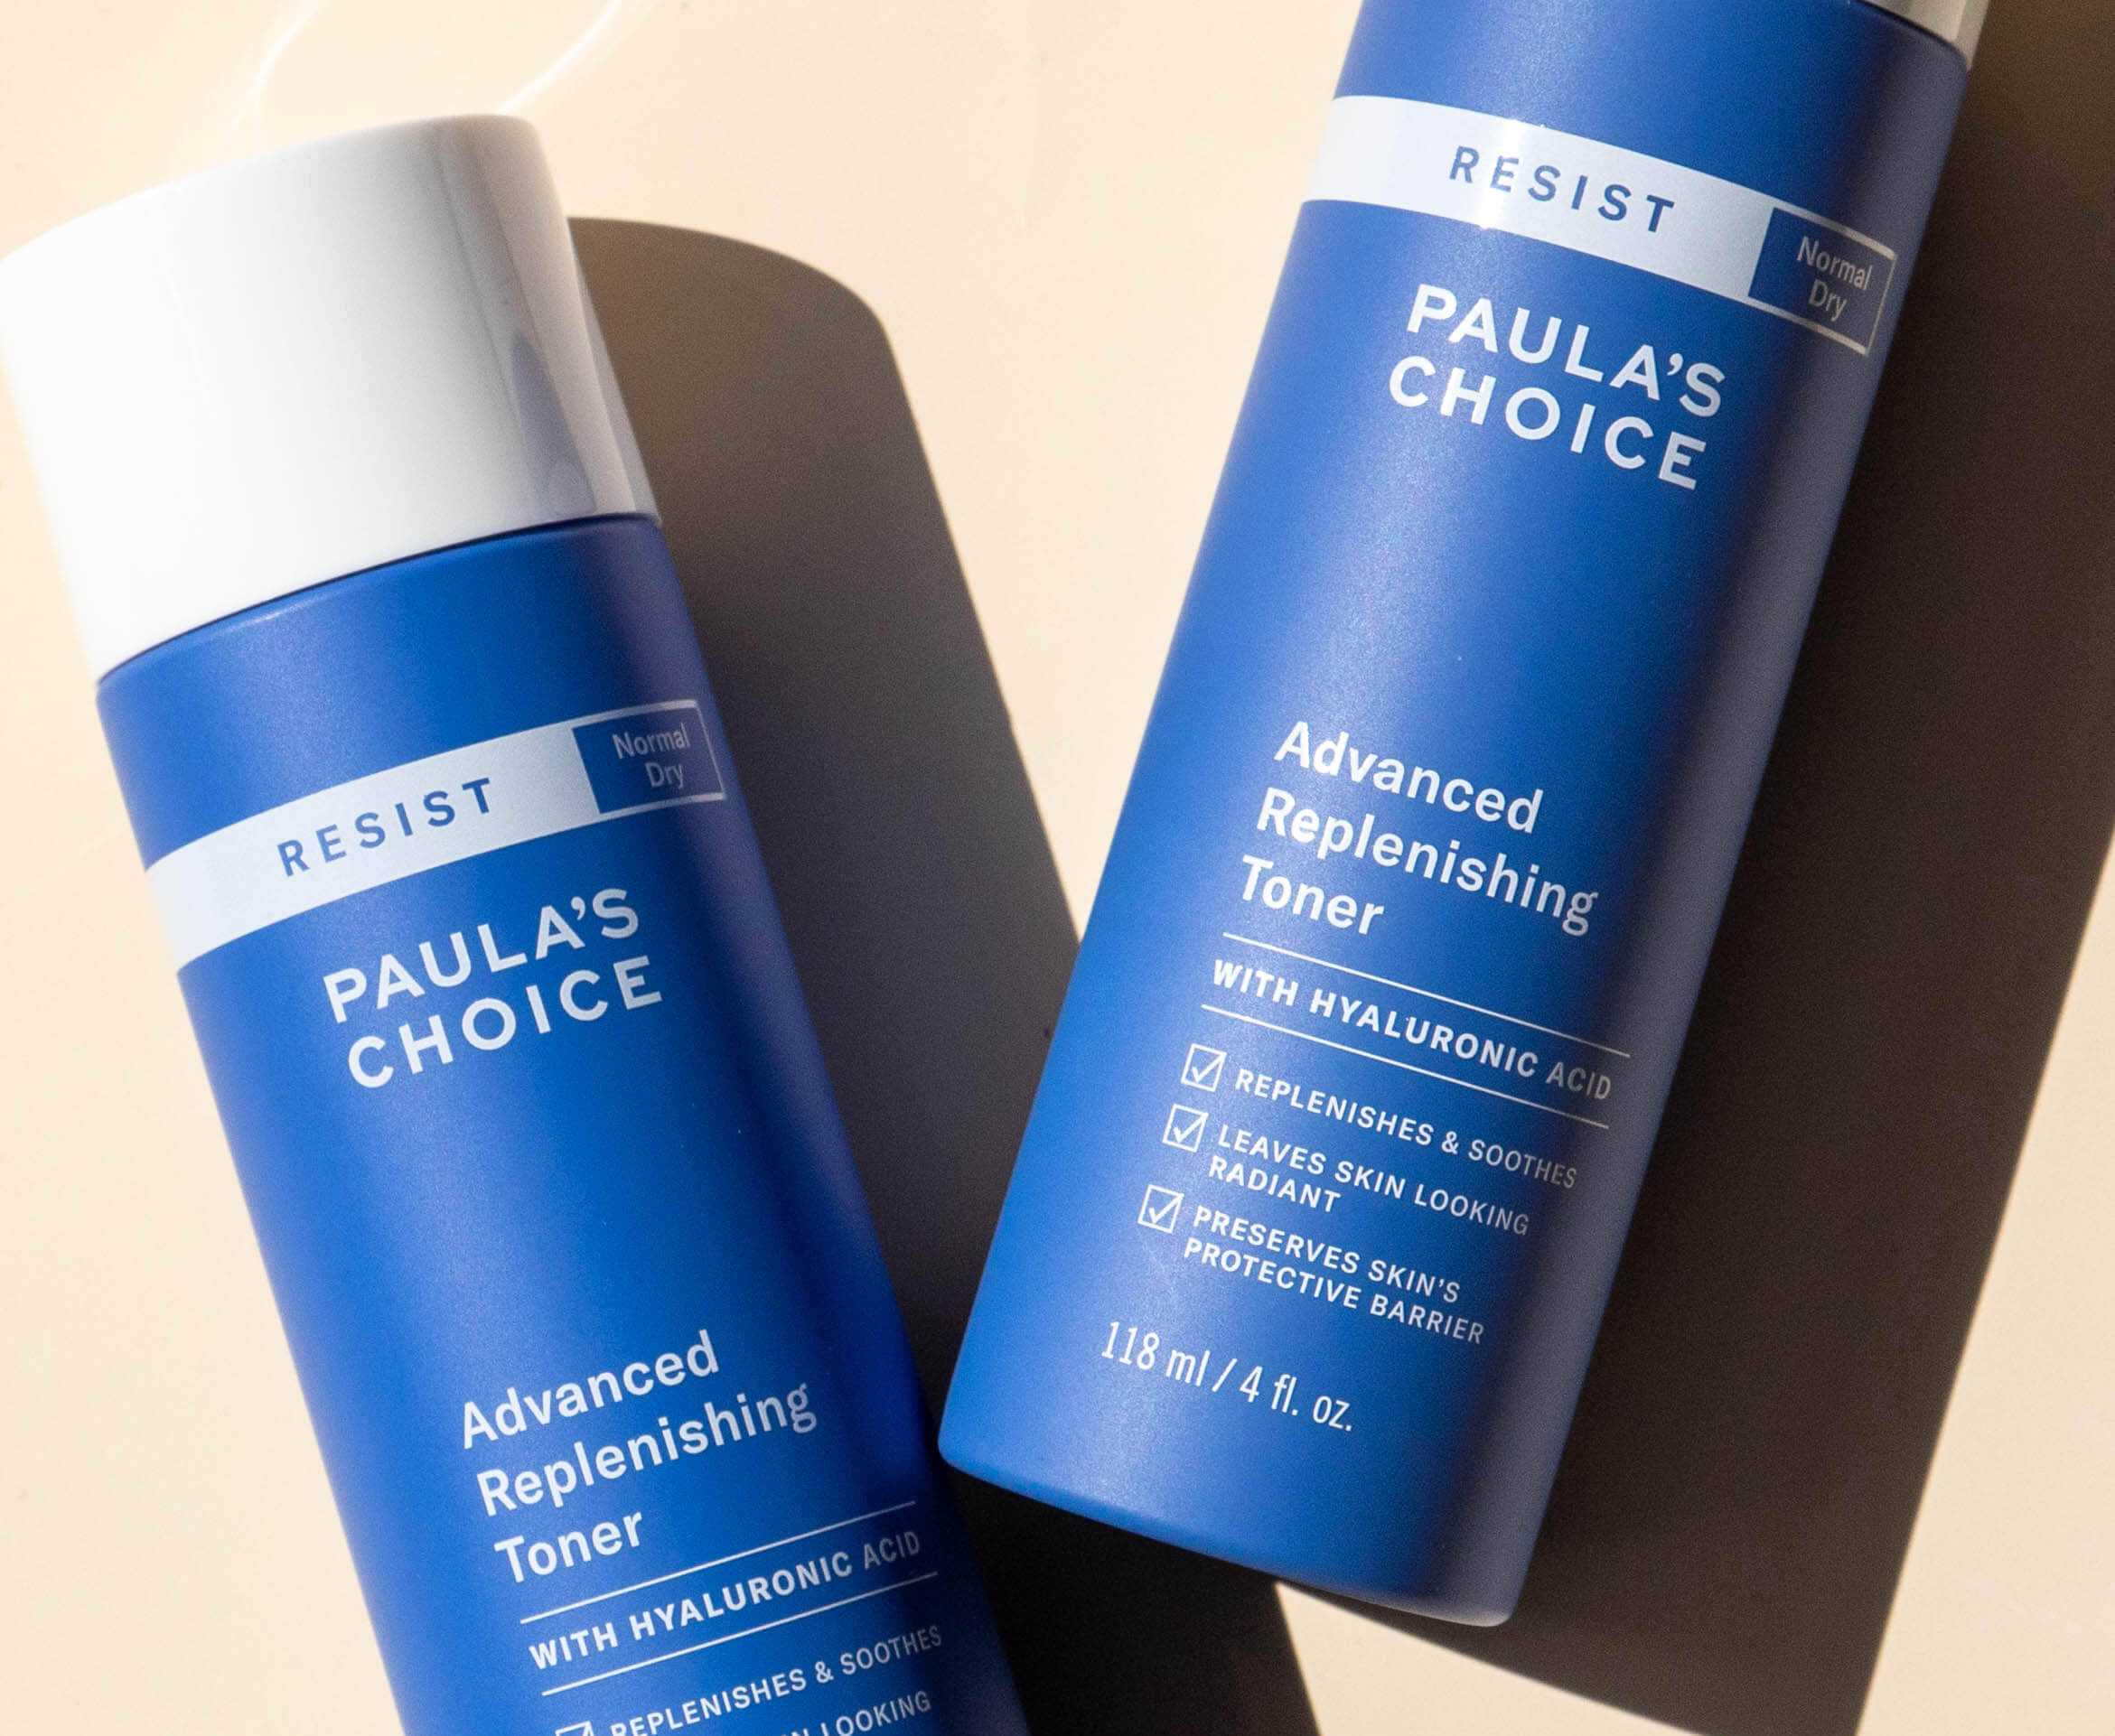 Paula's Choice Resist for Dry Skin